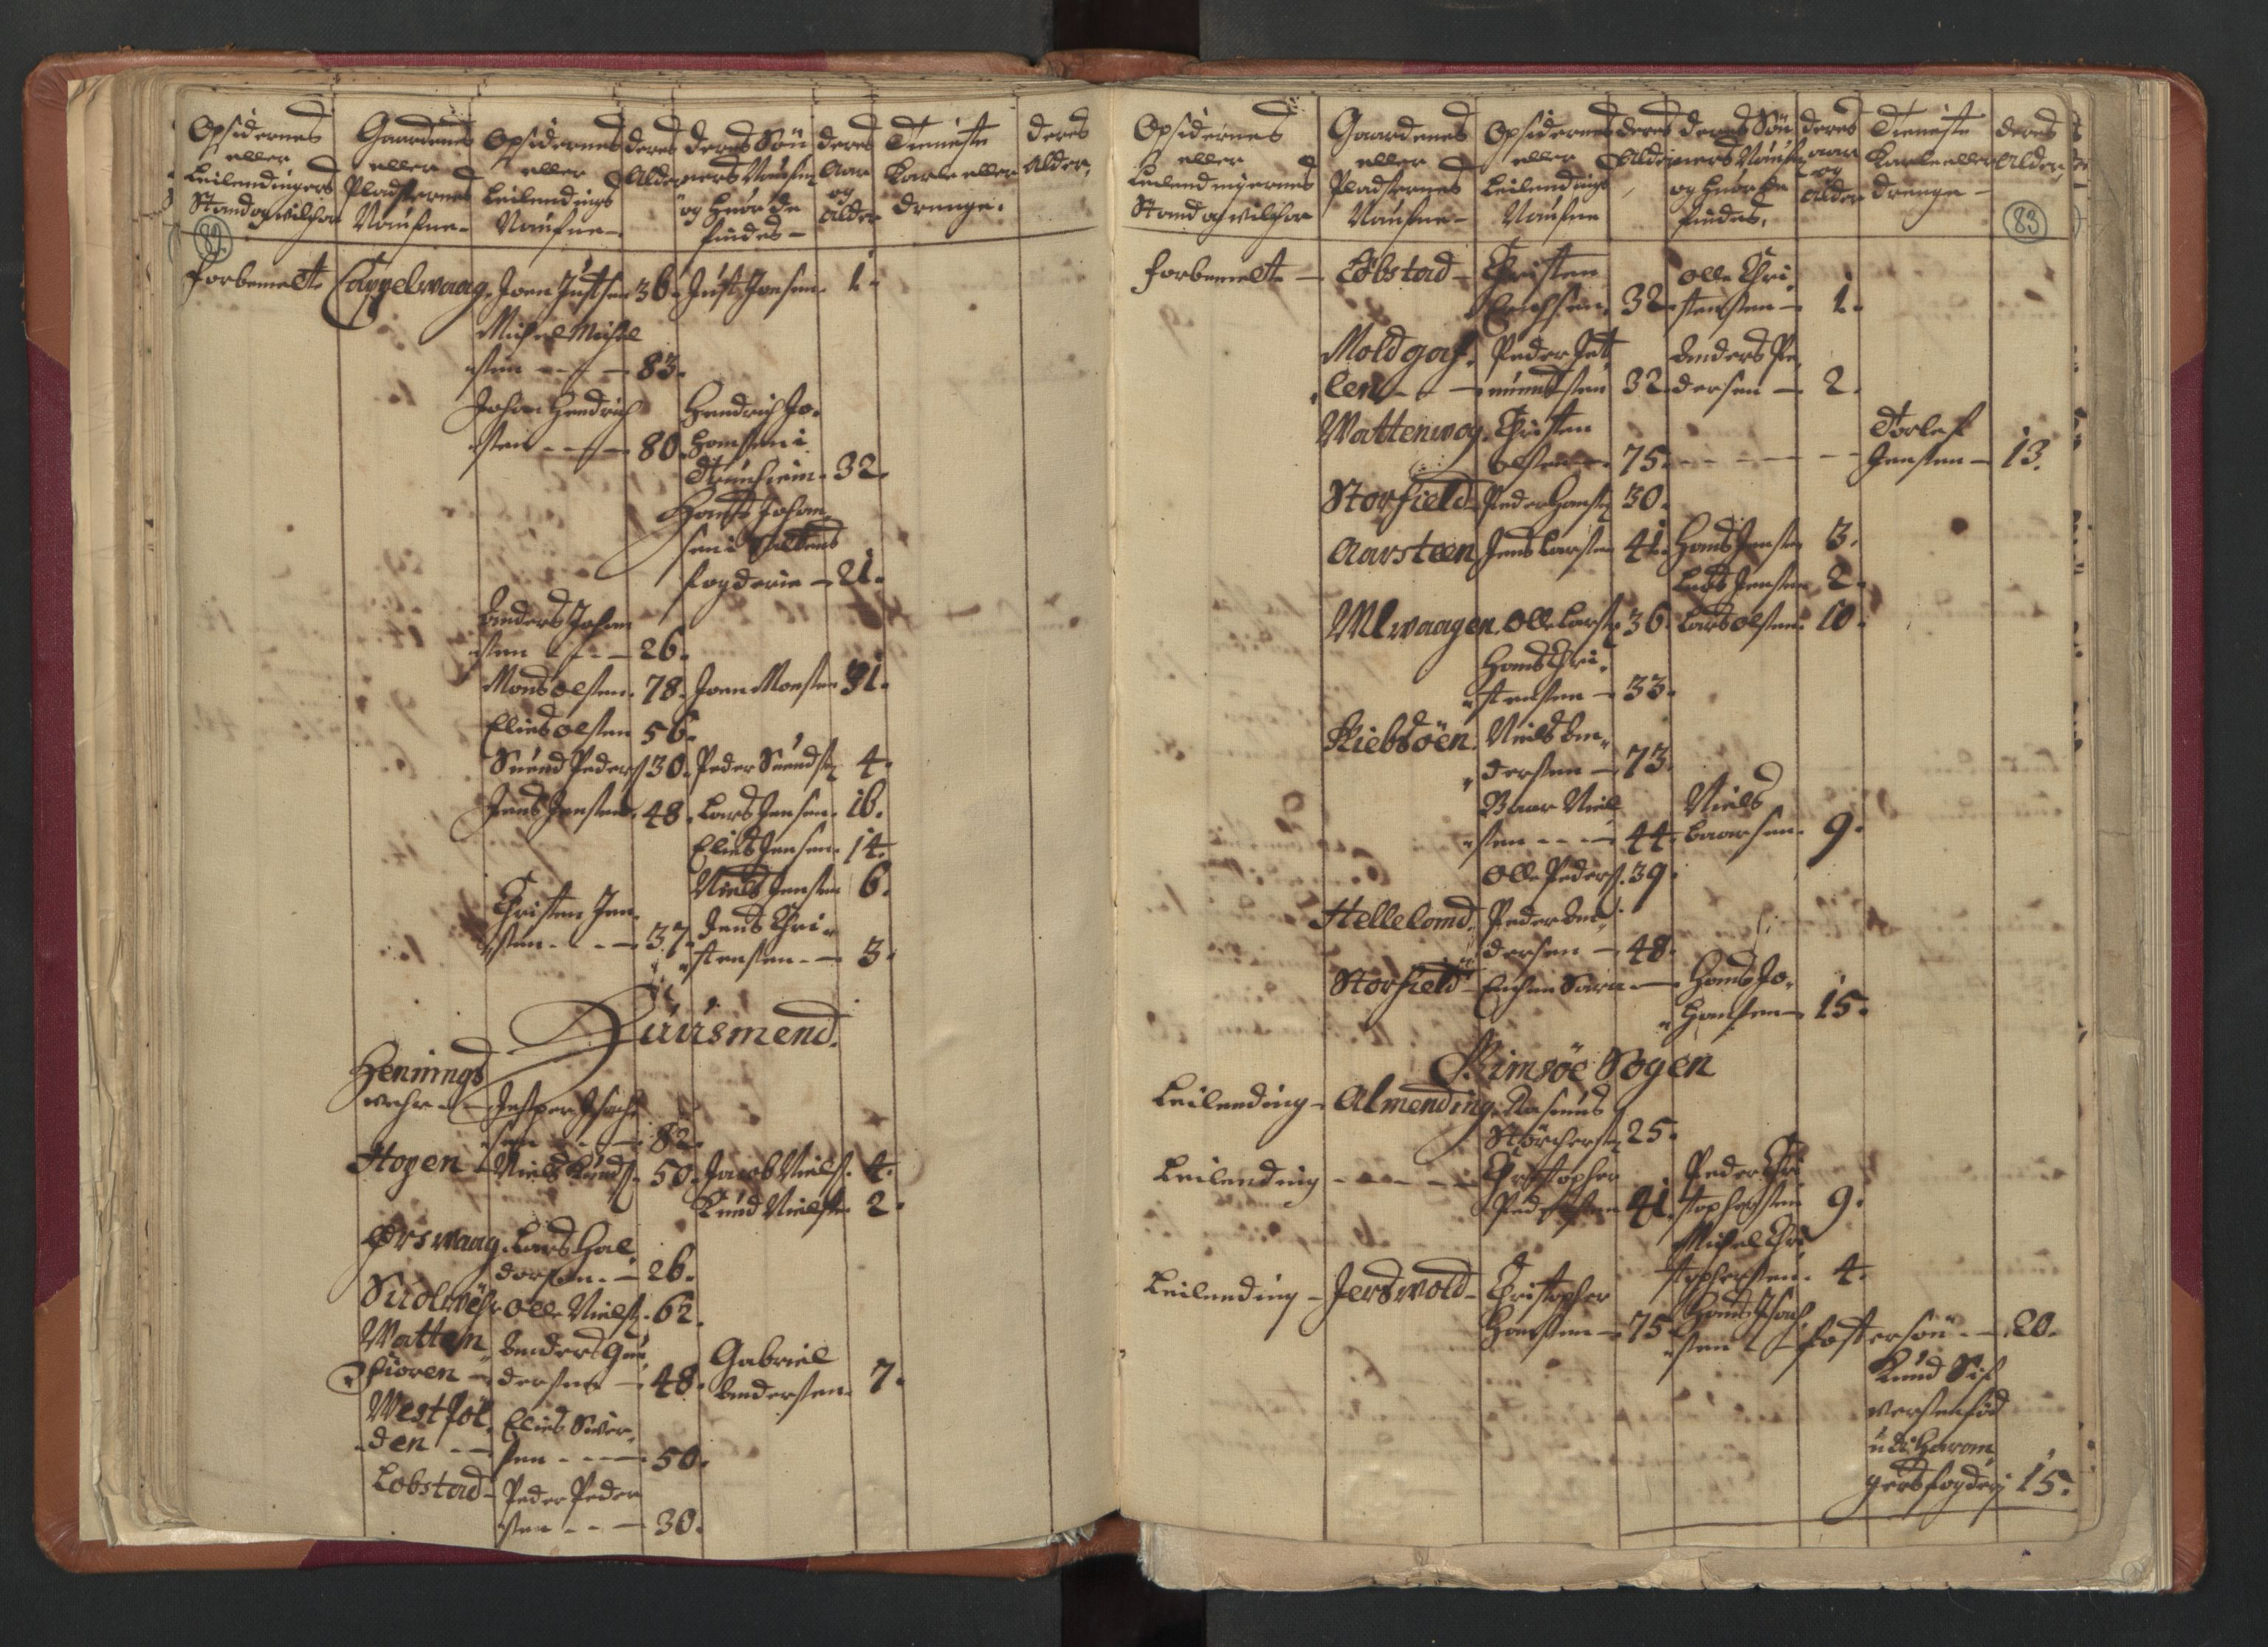 RA, Manntallet 1701, nr. 18: Vesterålen, Andenes og Lofoten fogderi, 1701, s. 82-83